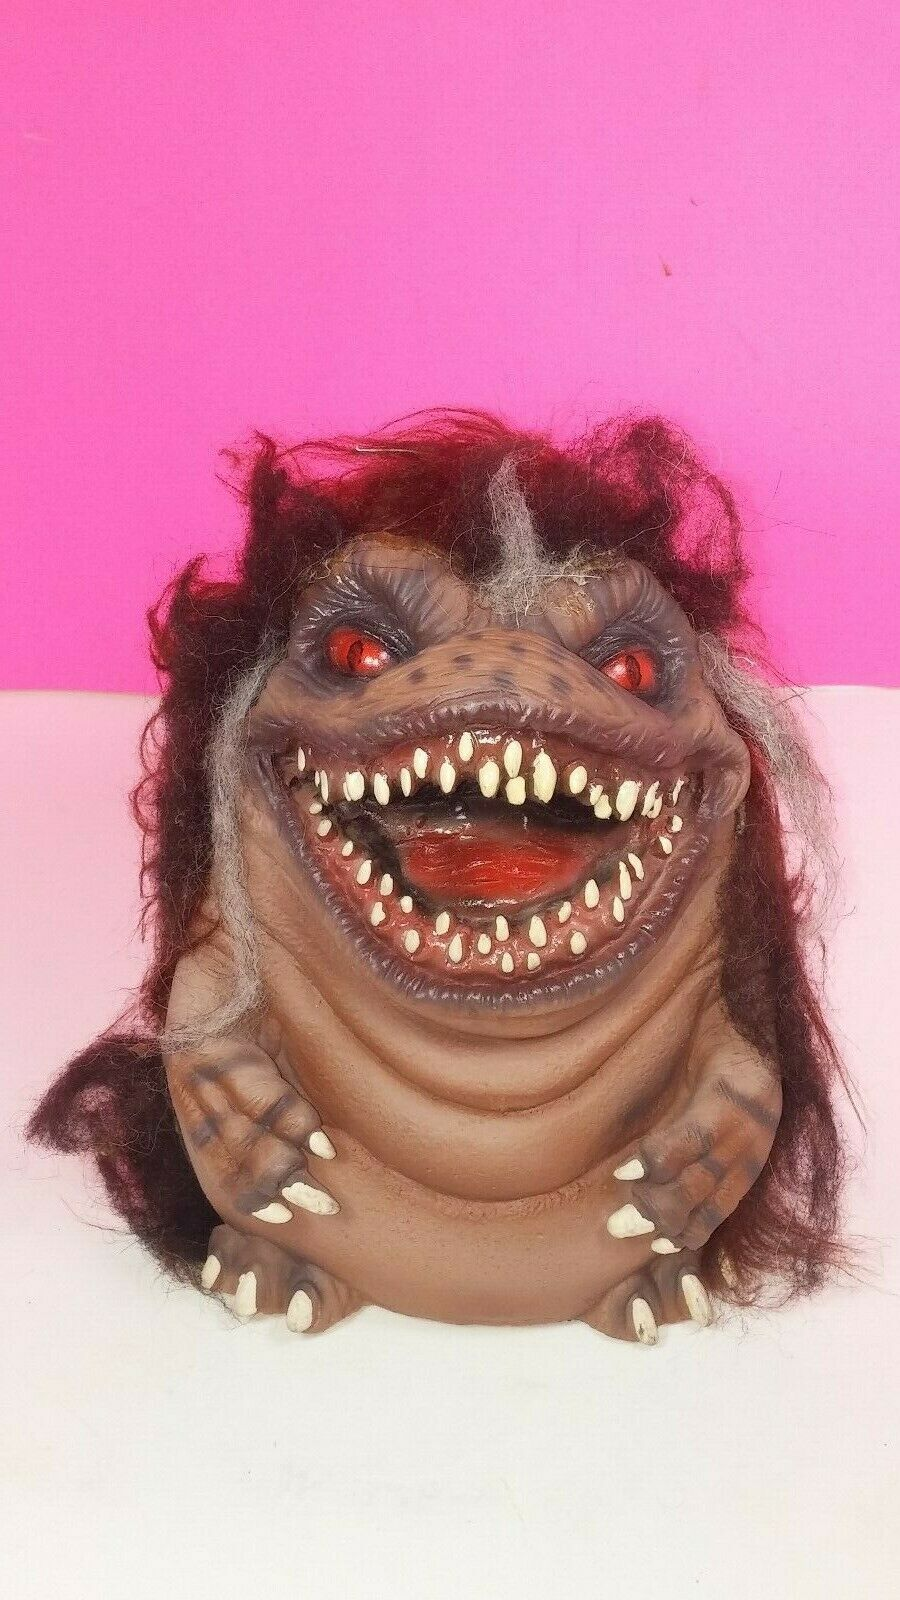 1986 Critters Horror New Line Vintage Puppet Figure Prop Replica Rare